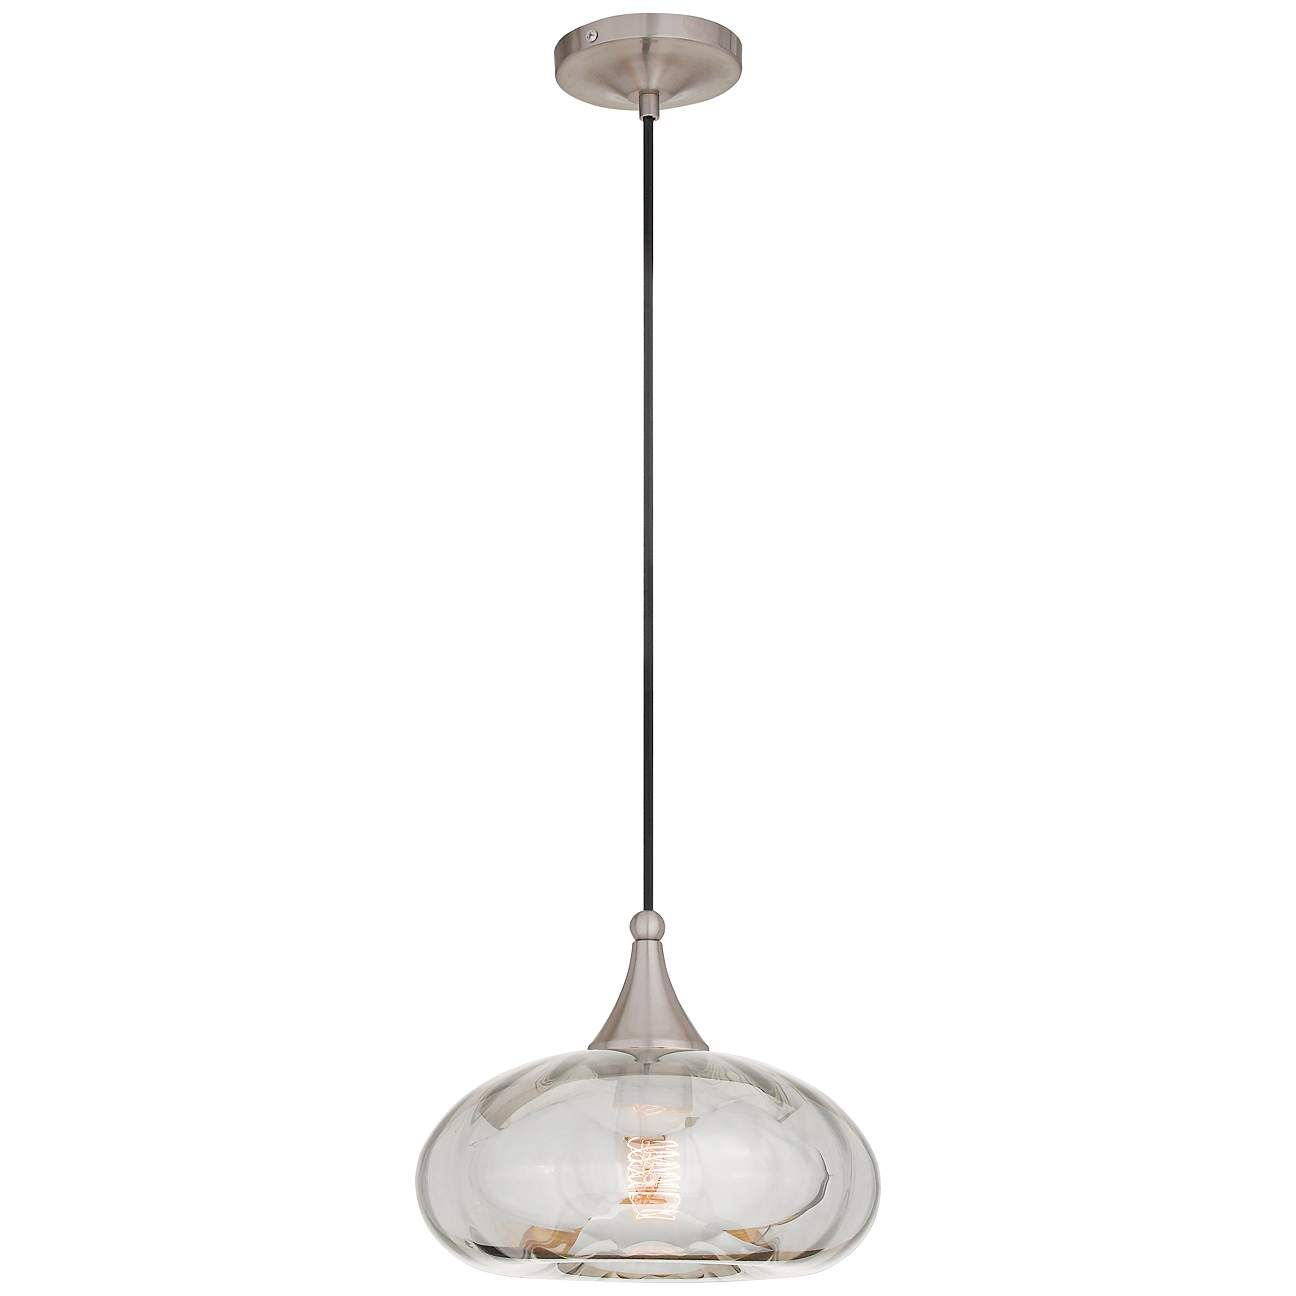 Art Glass 9 1 2 Wide Brushed Nickel Mini Pendant 55j33 Lamps Plus In 2021 Brushed Nickel Pendant Lights Mini Pendant Glass Art